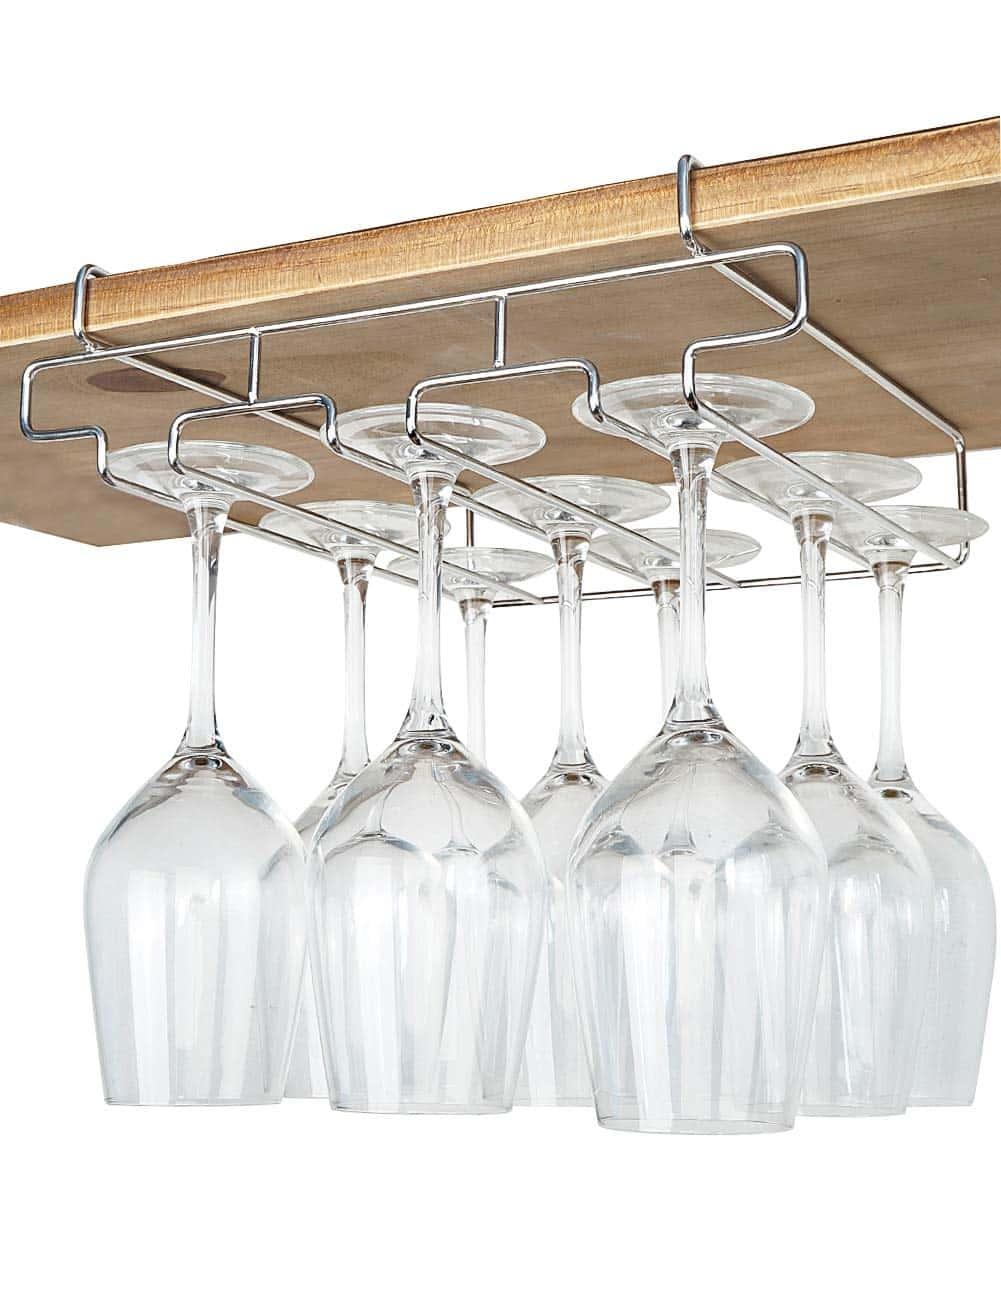 newthinking wine glass rack under